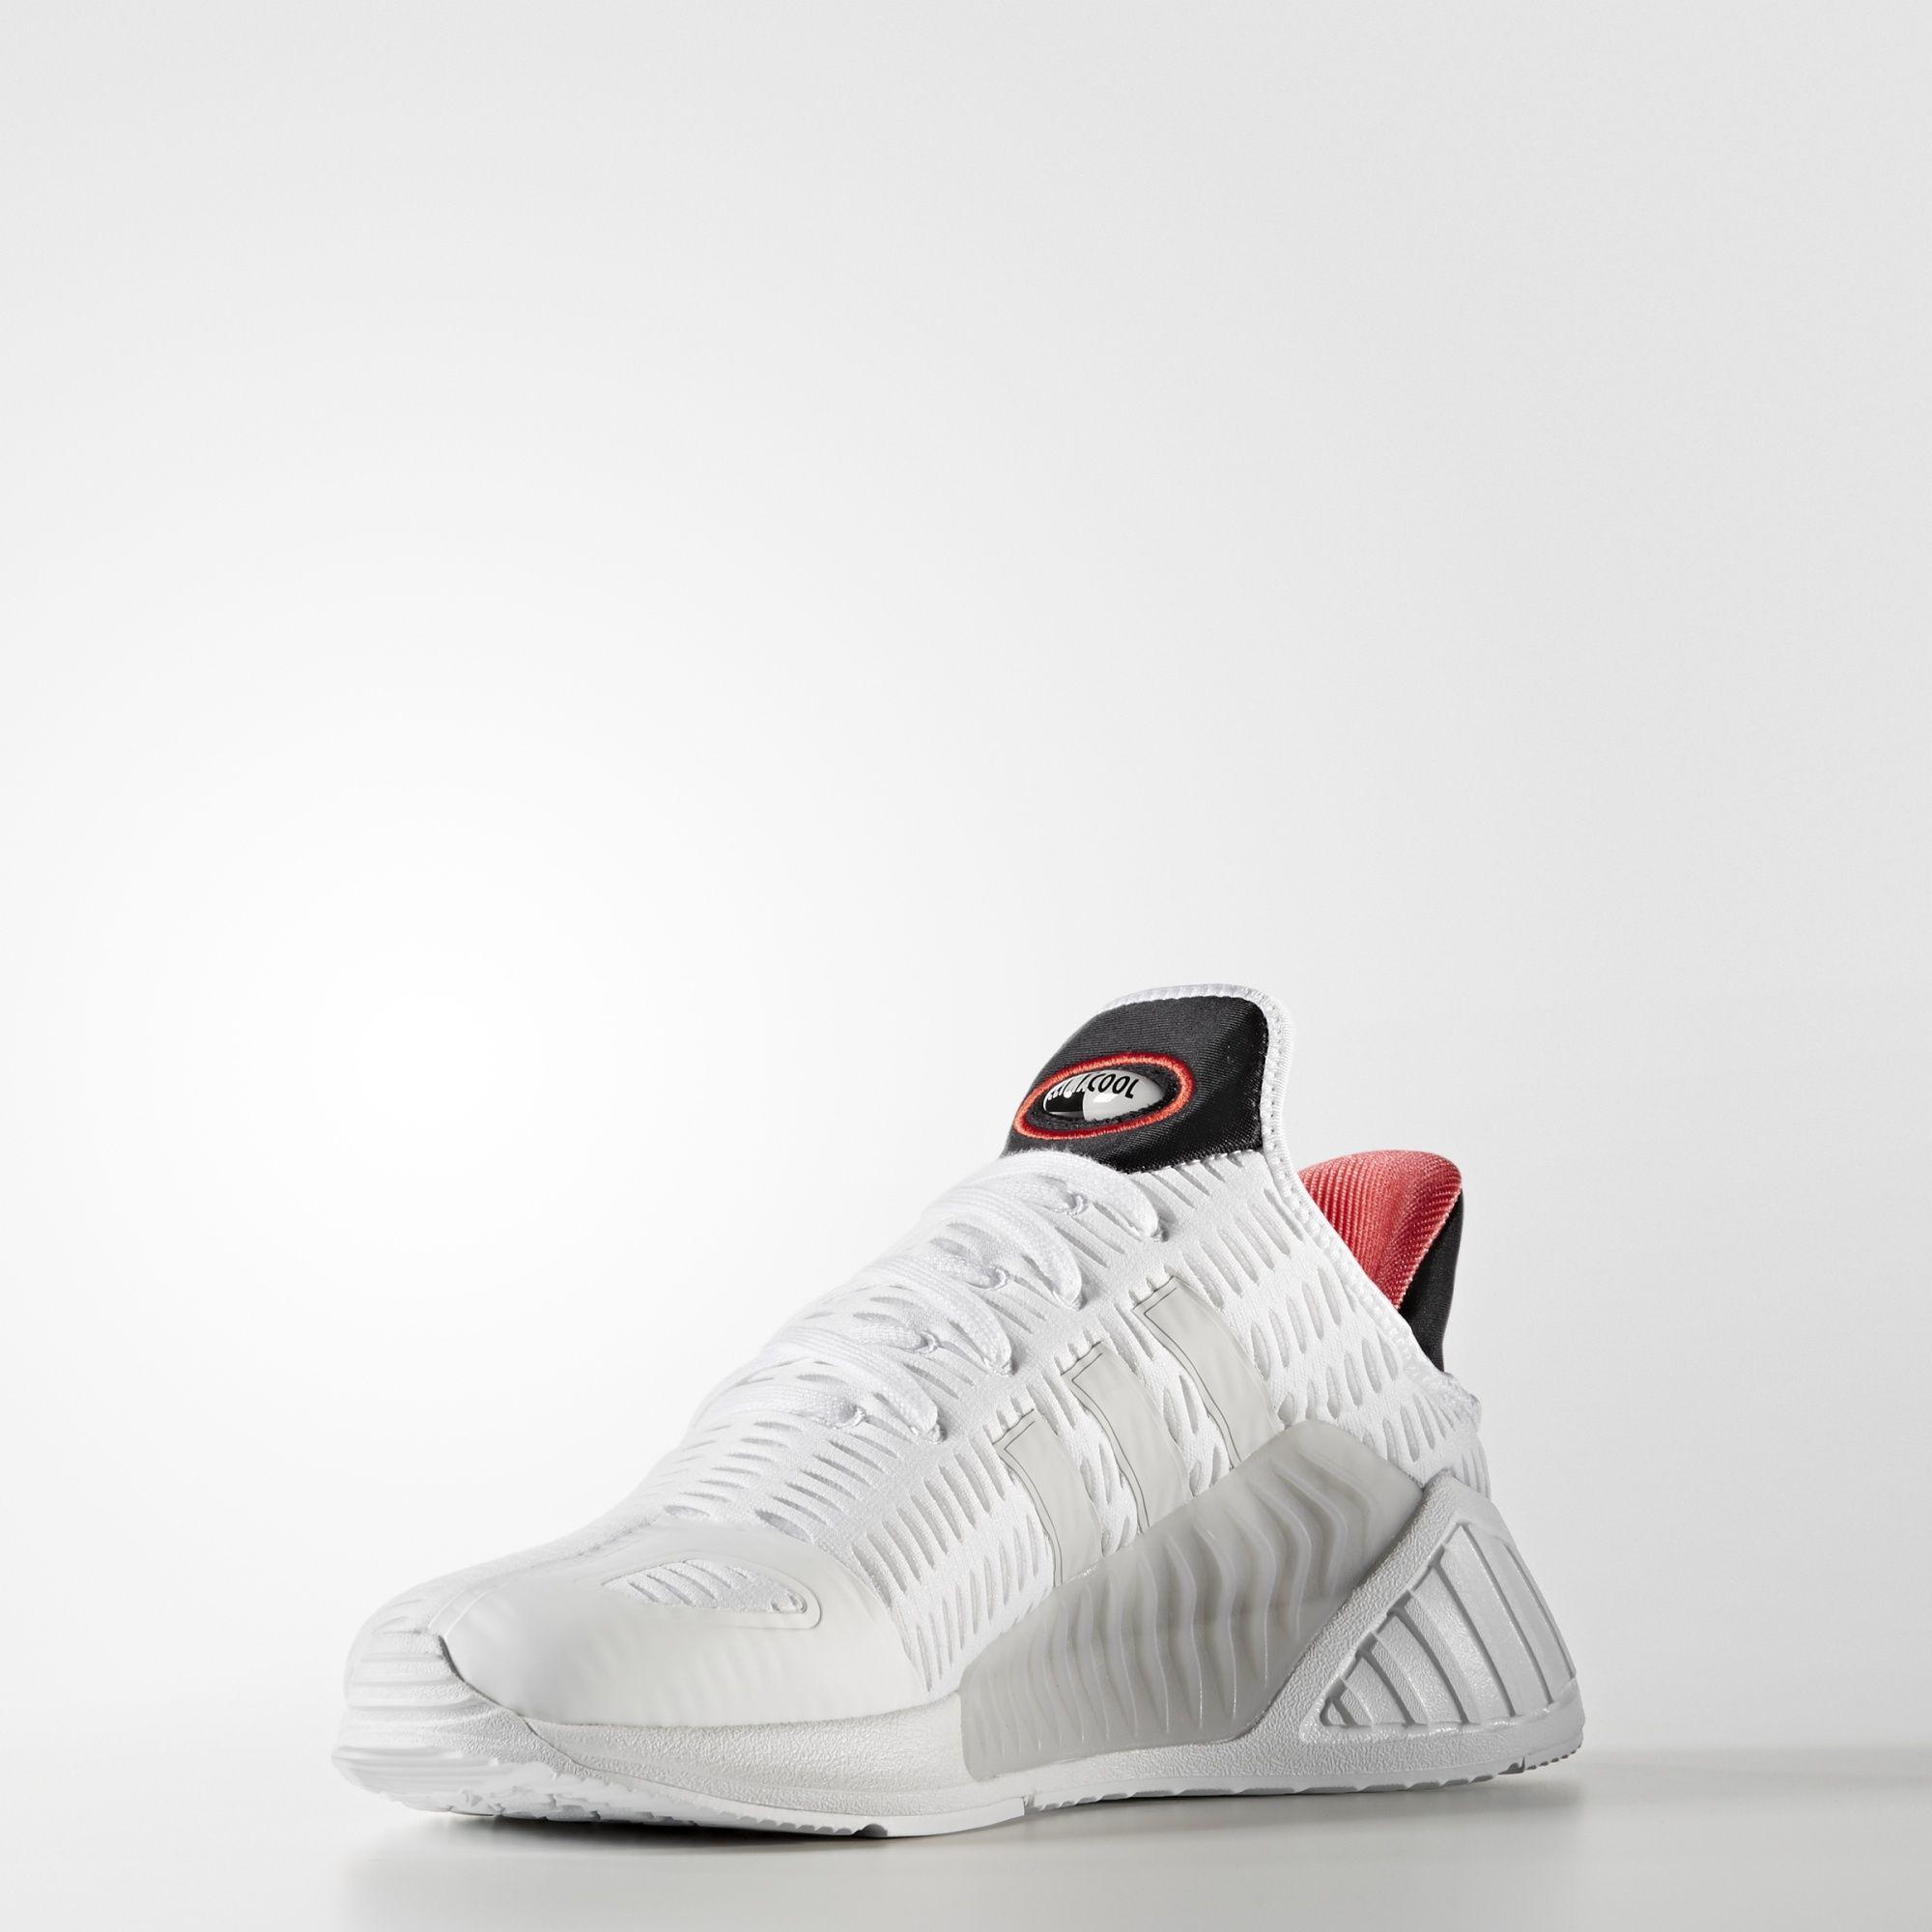 BZ0246 adidas Climacool 02.17 White Grey 3